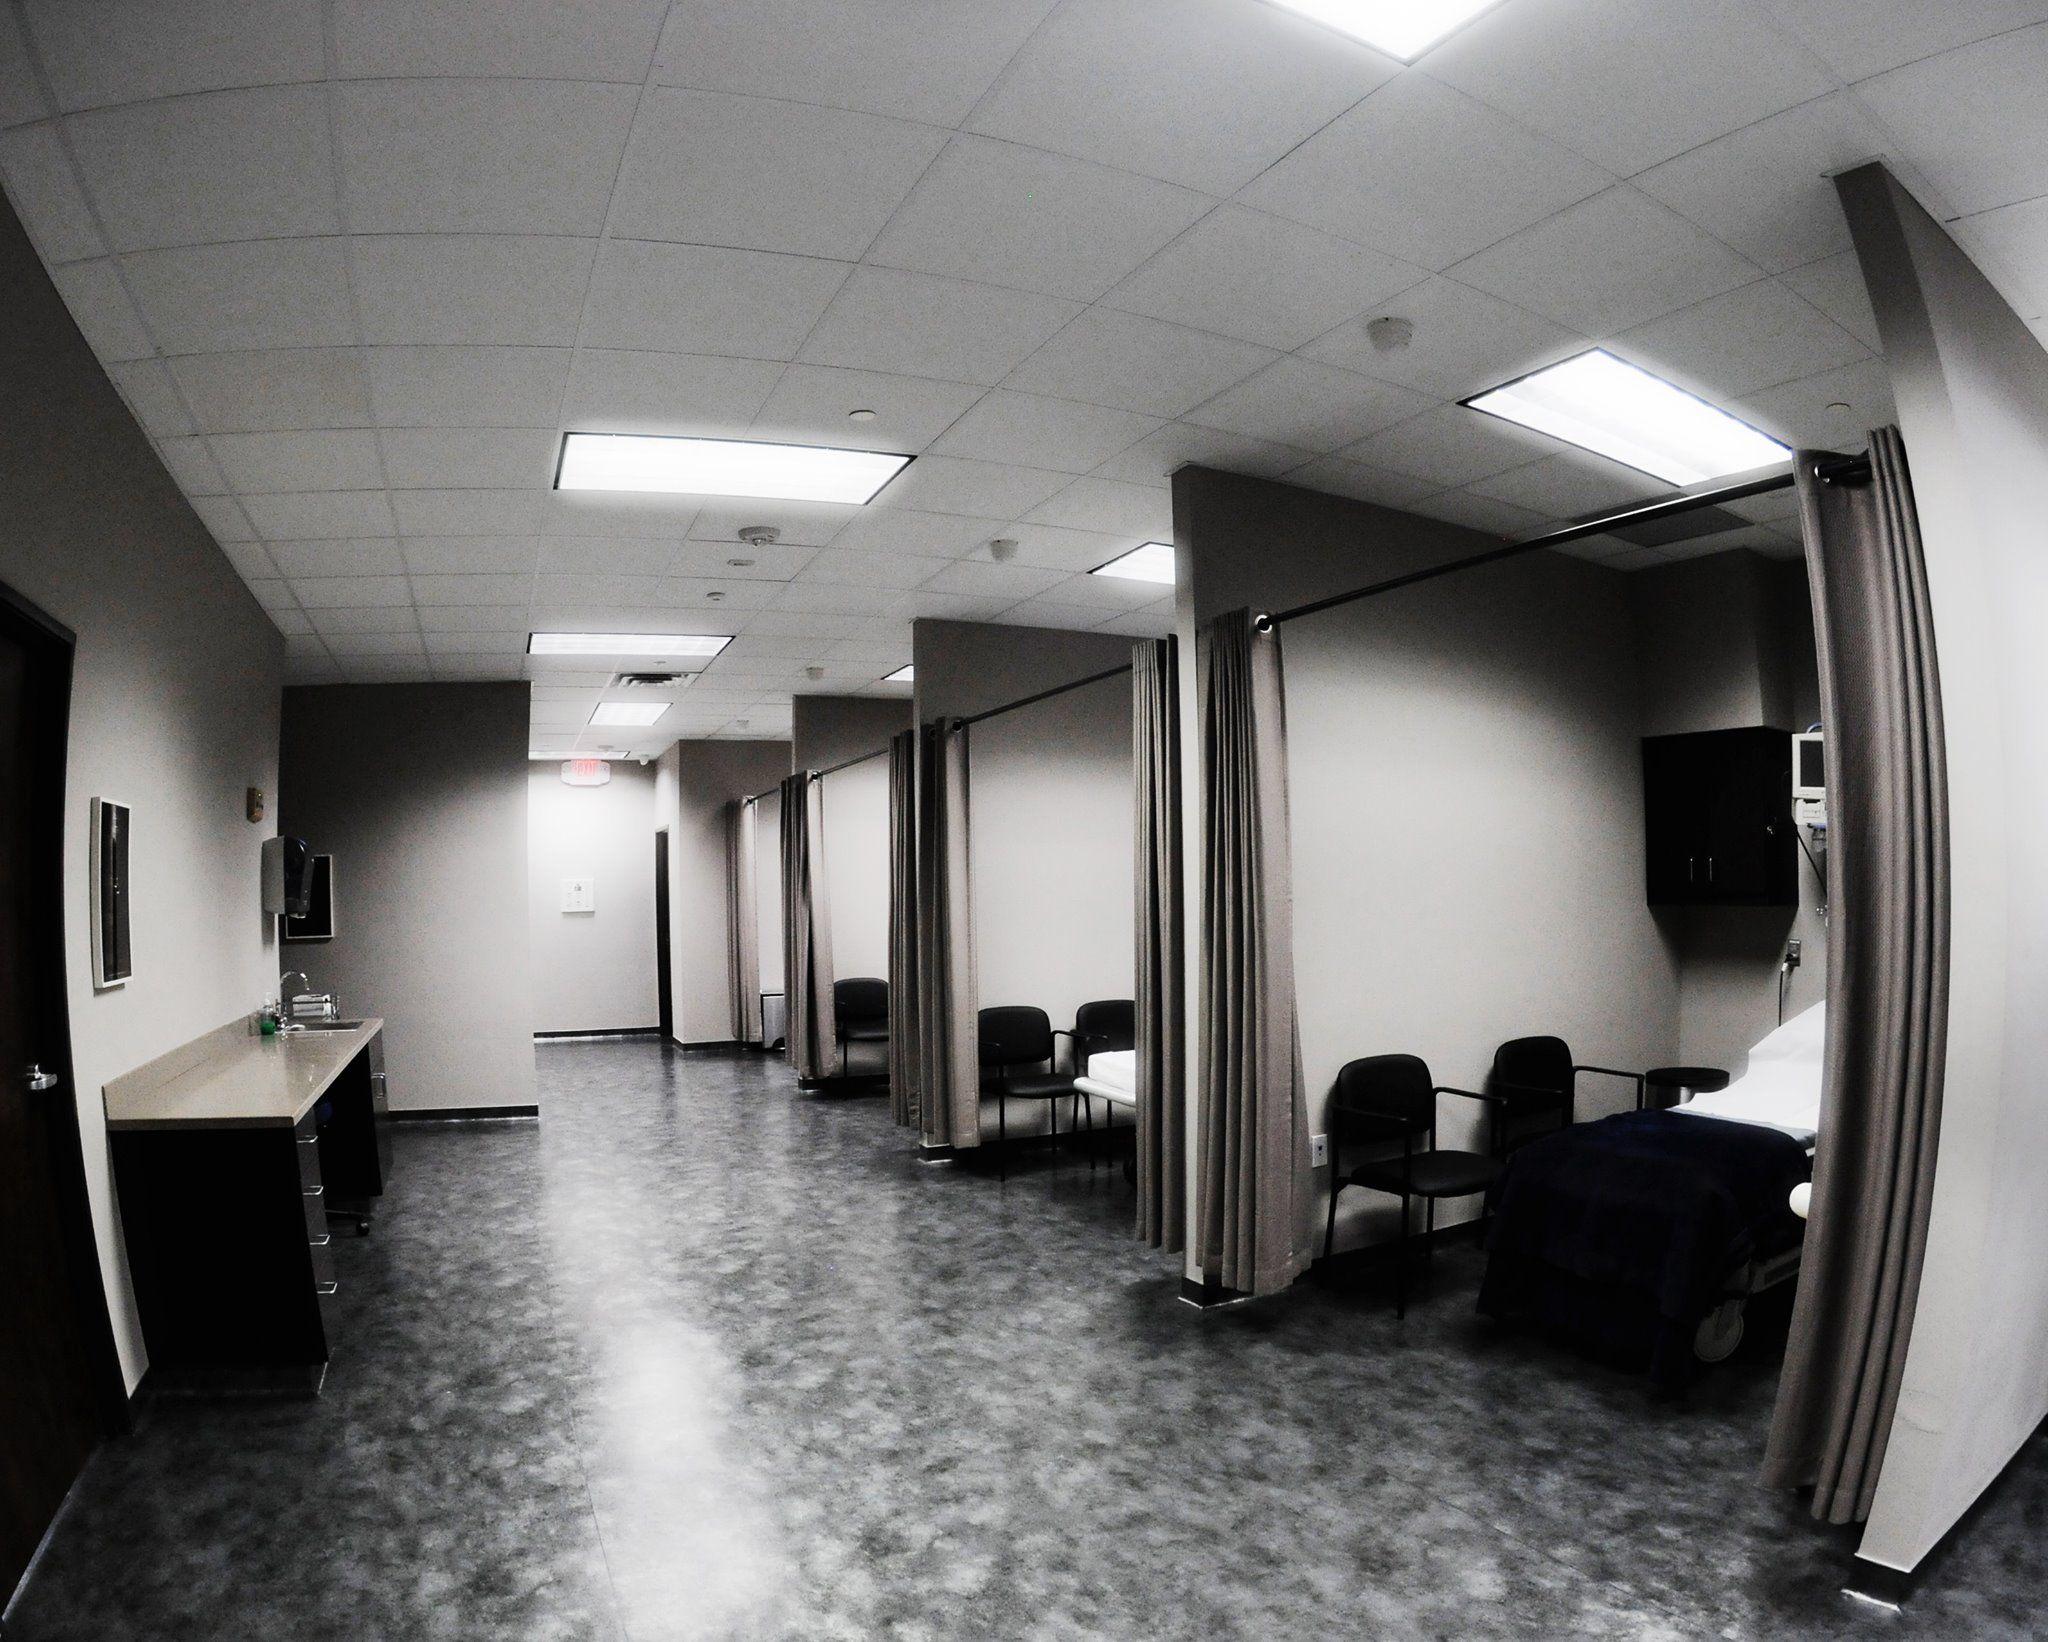 Jones Plastic Surgery Recovery Room